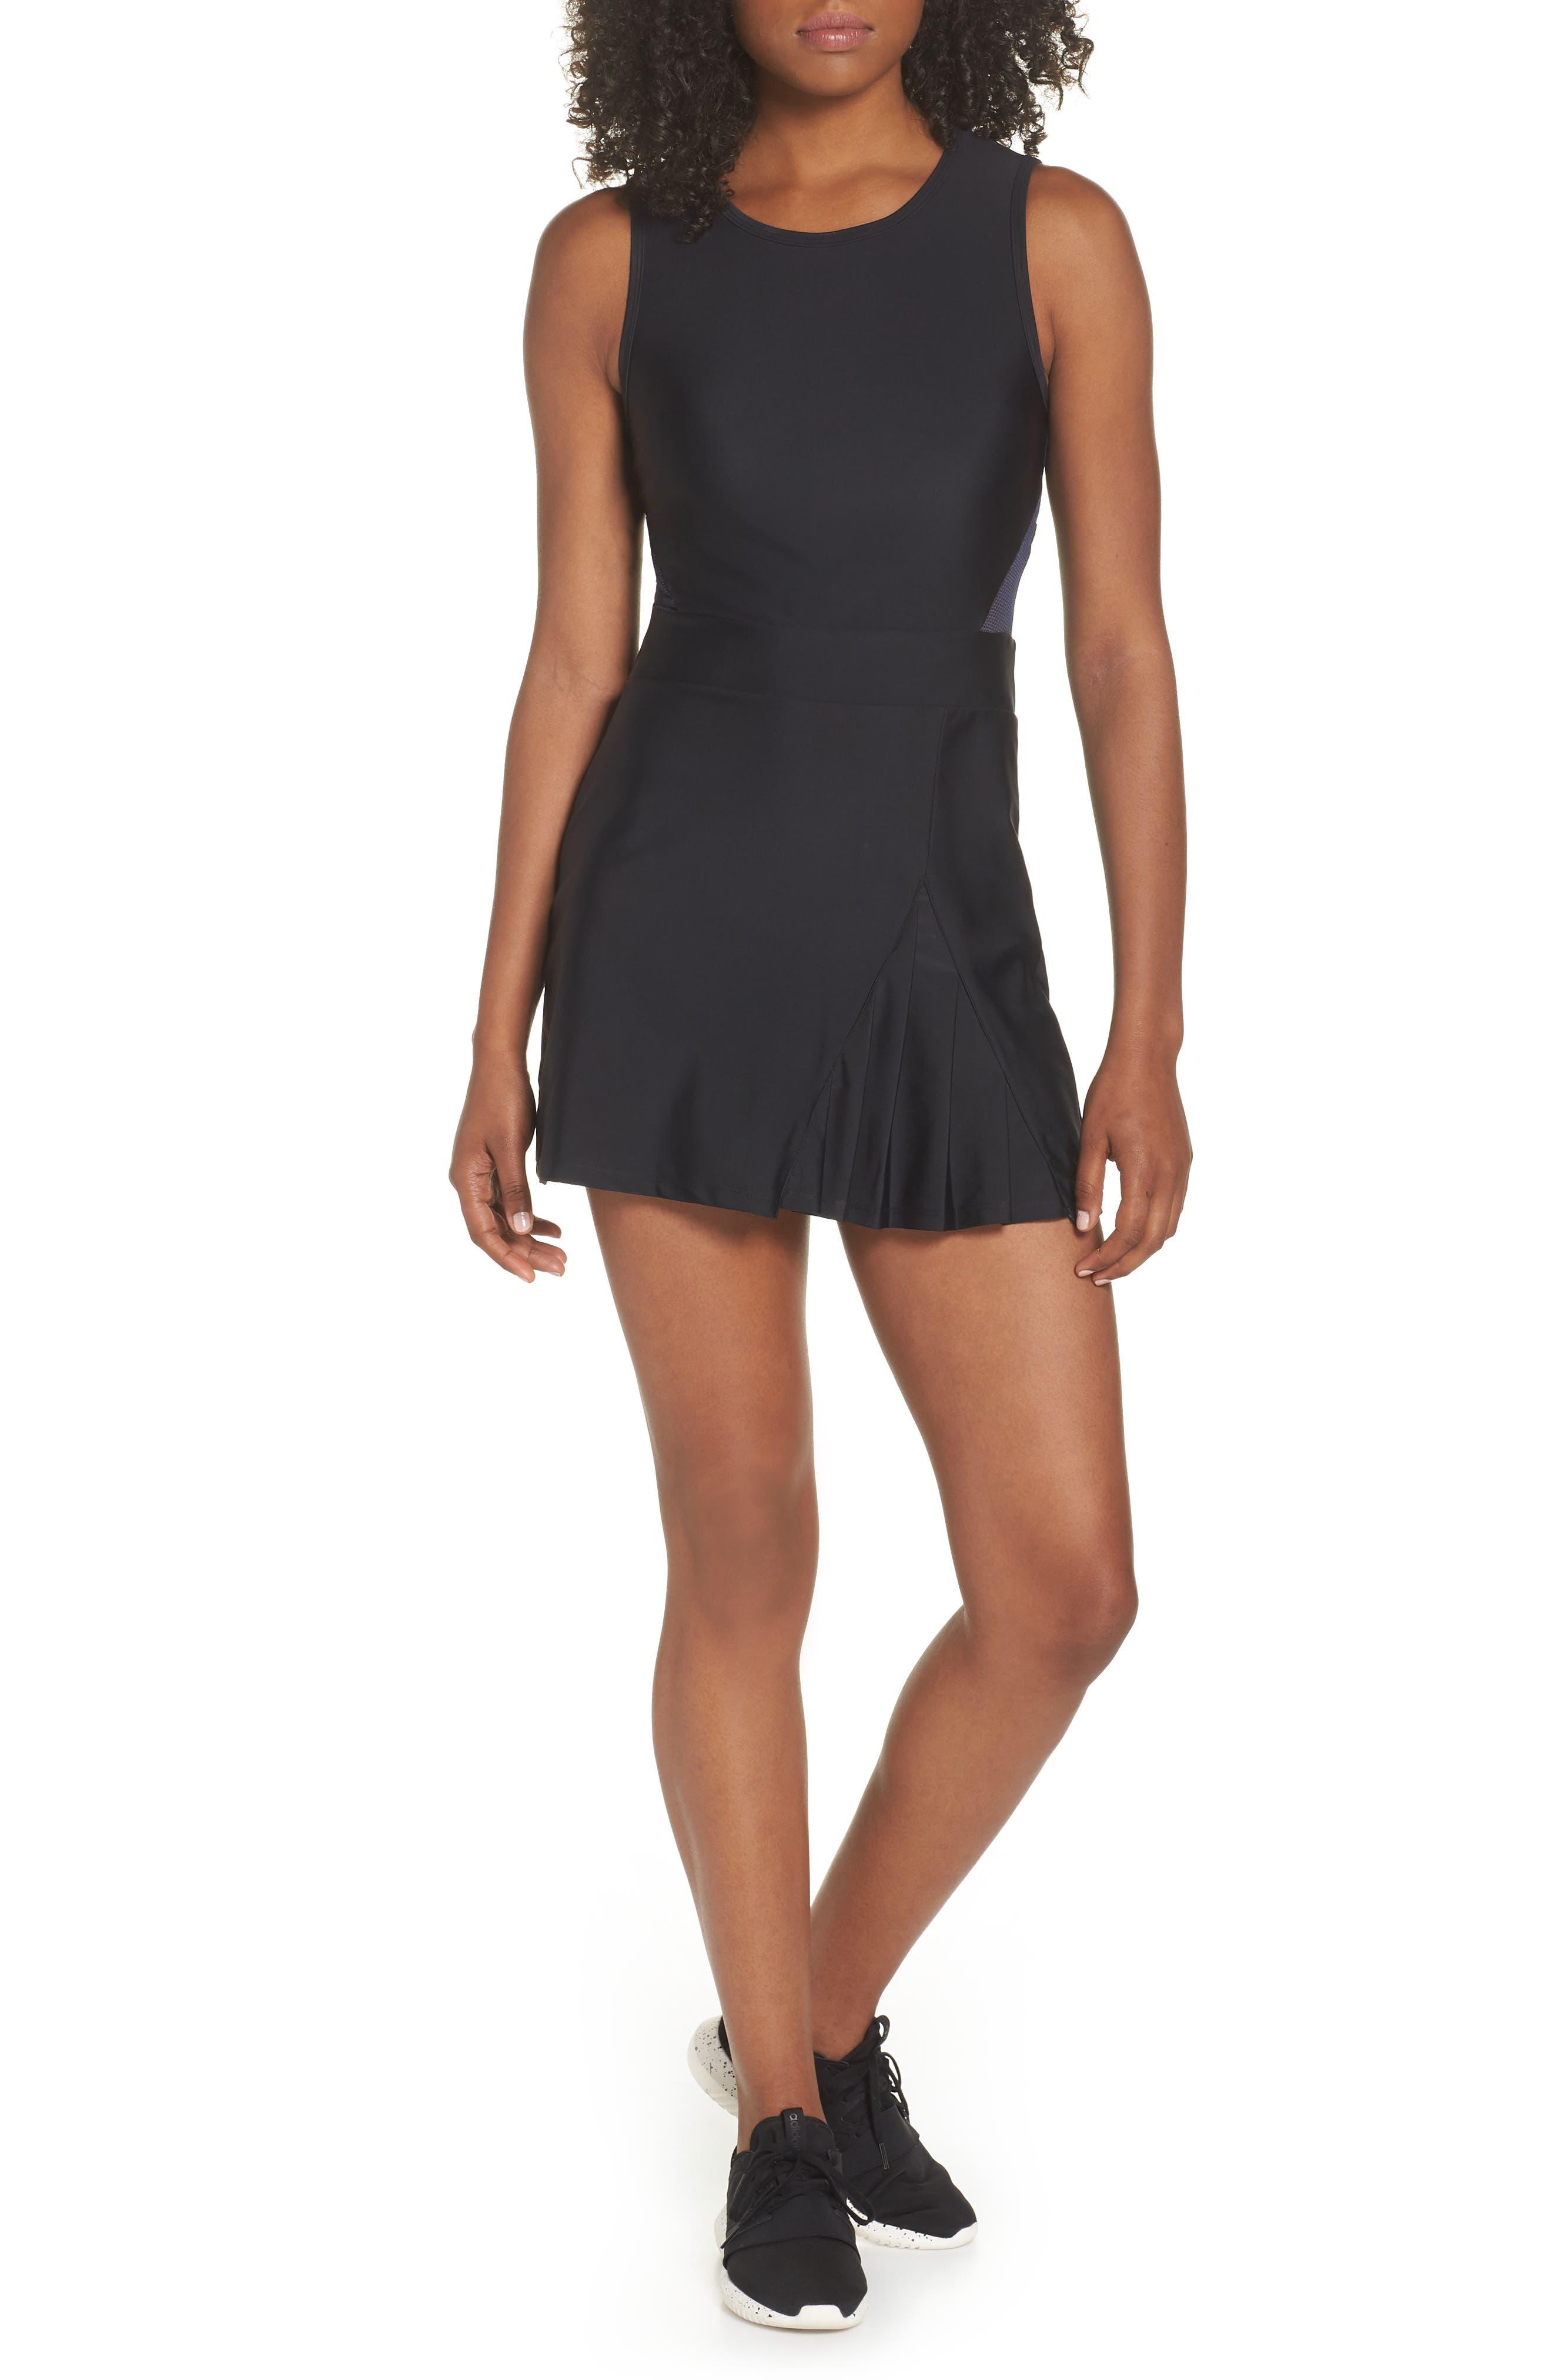 BoomBoom Athletica Tennis Dress,                             Main thumbnail 1, color,                             BLACK/ NAVY